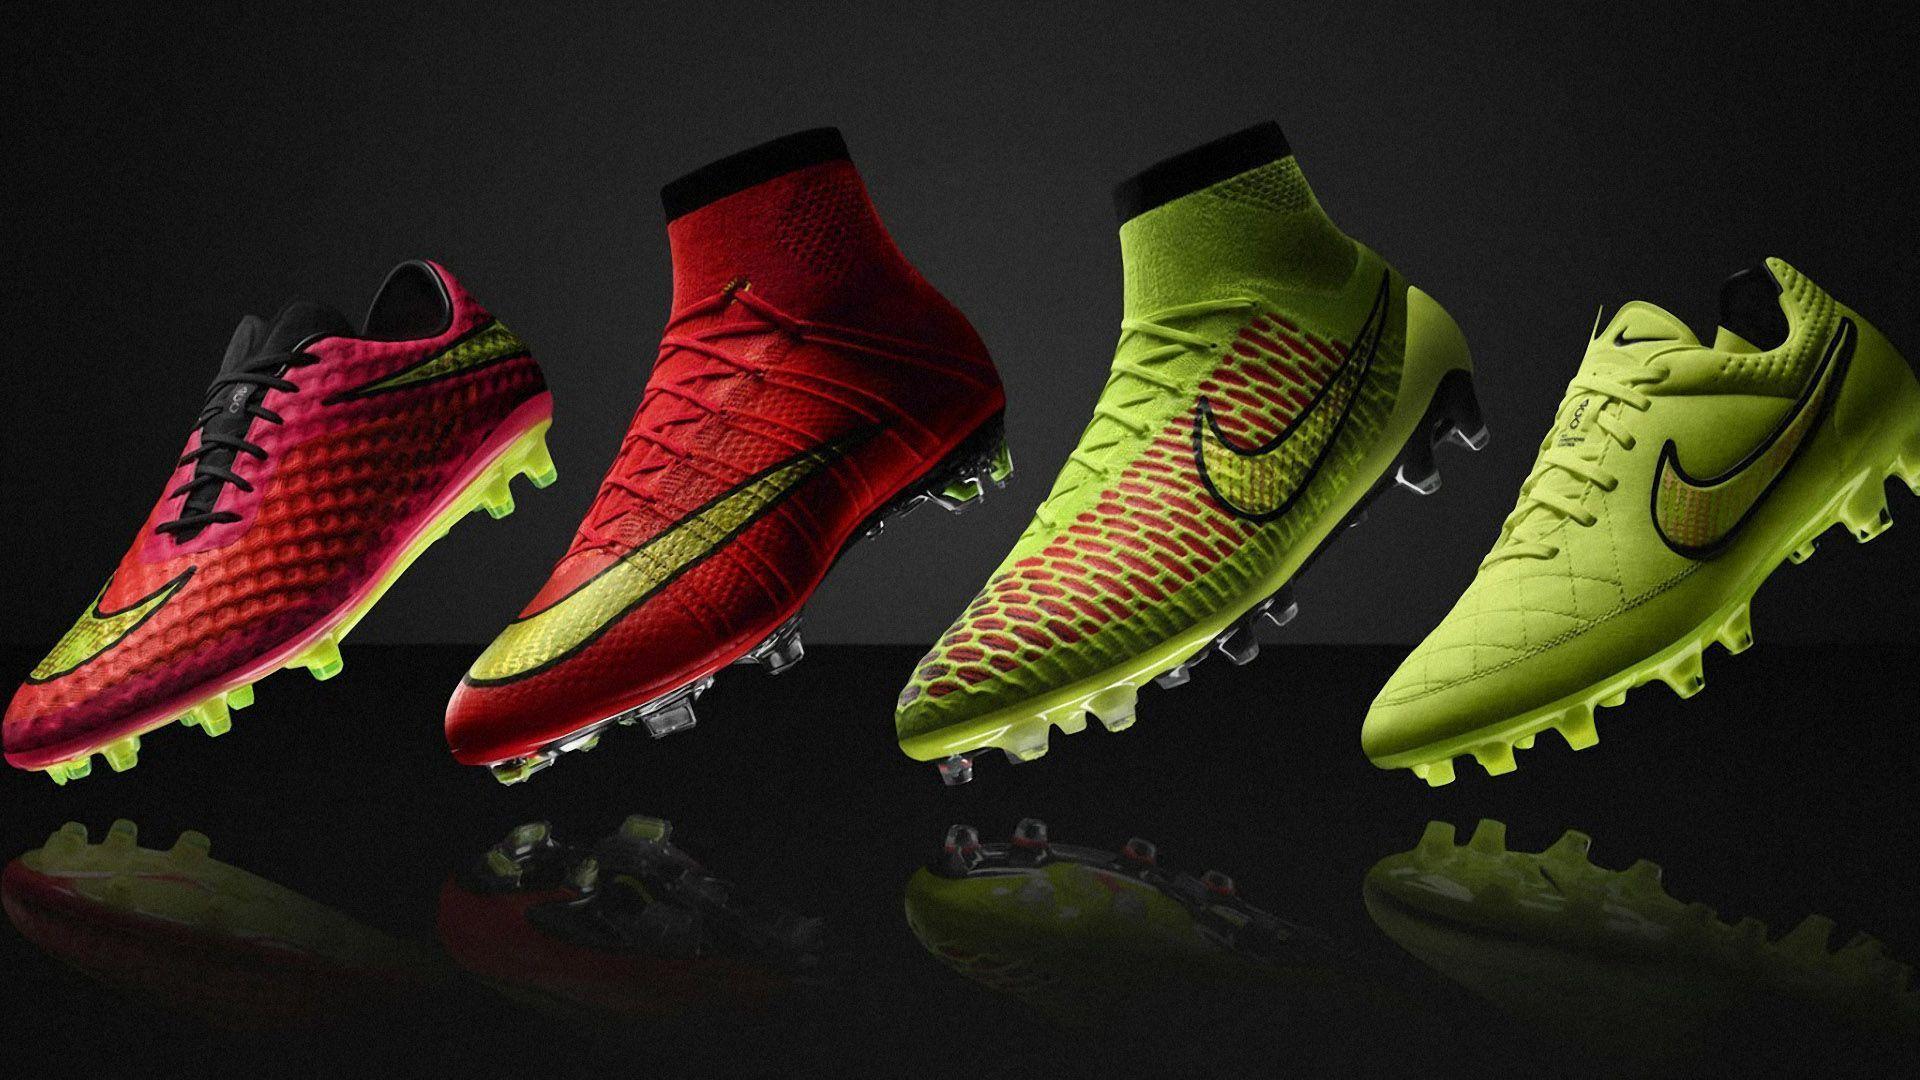 Nike Soccer Wallpaper 2014 Iphone